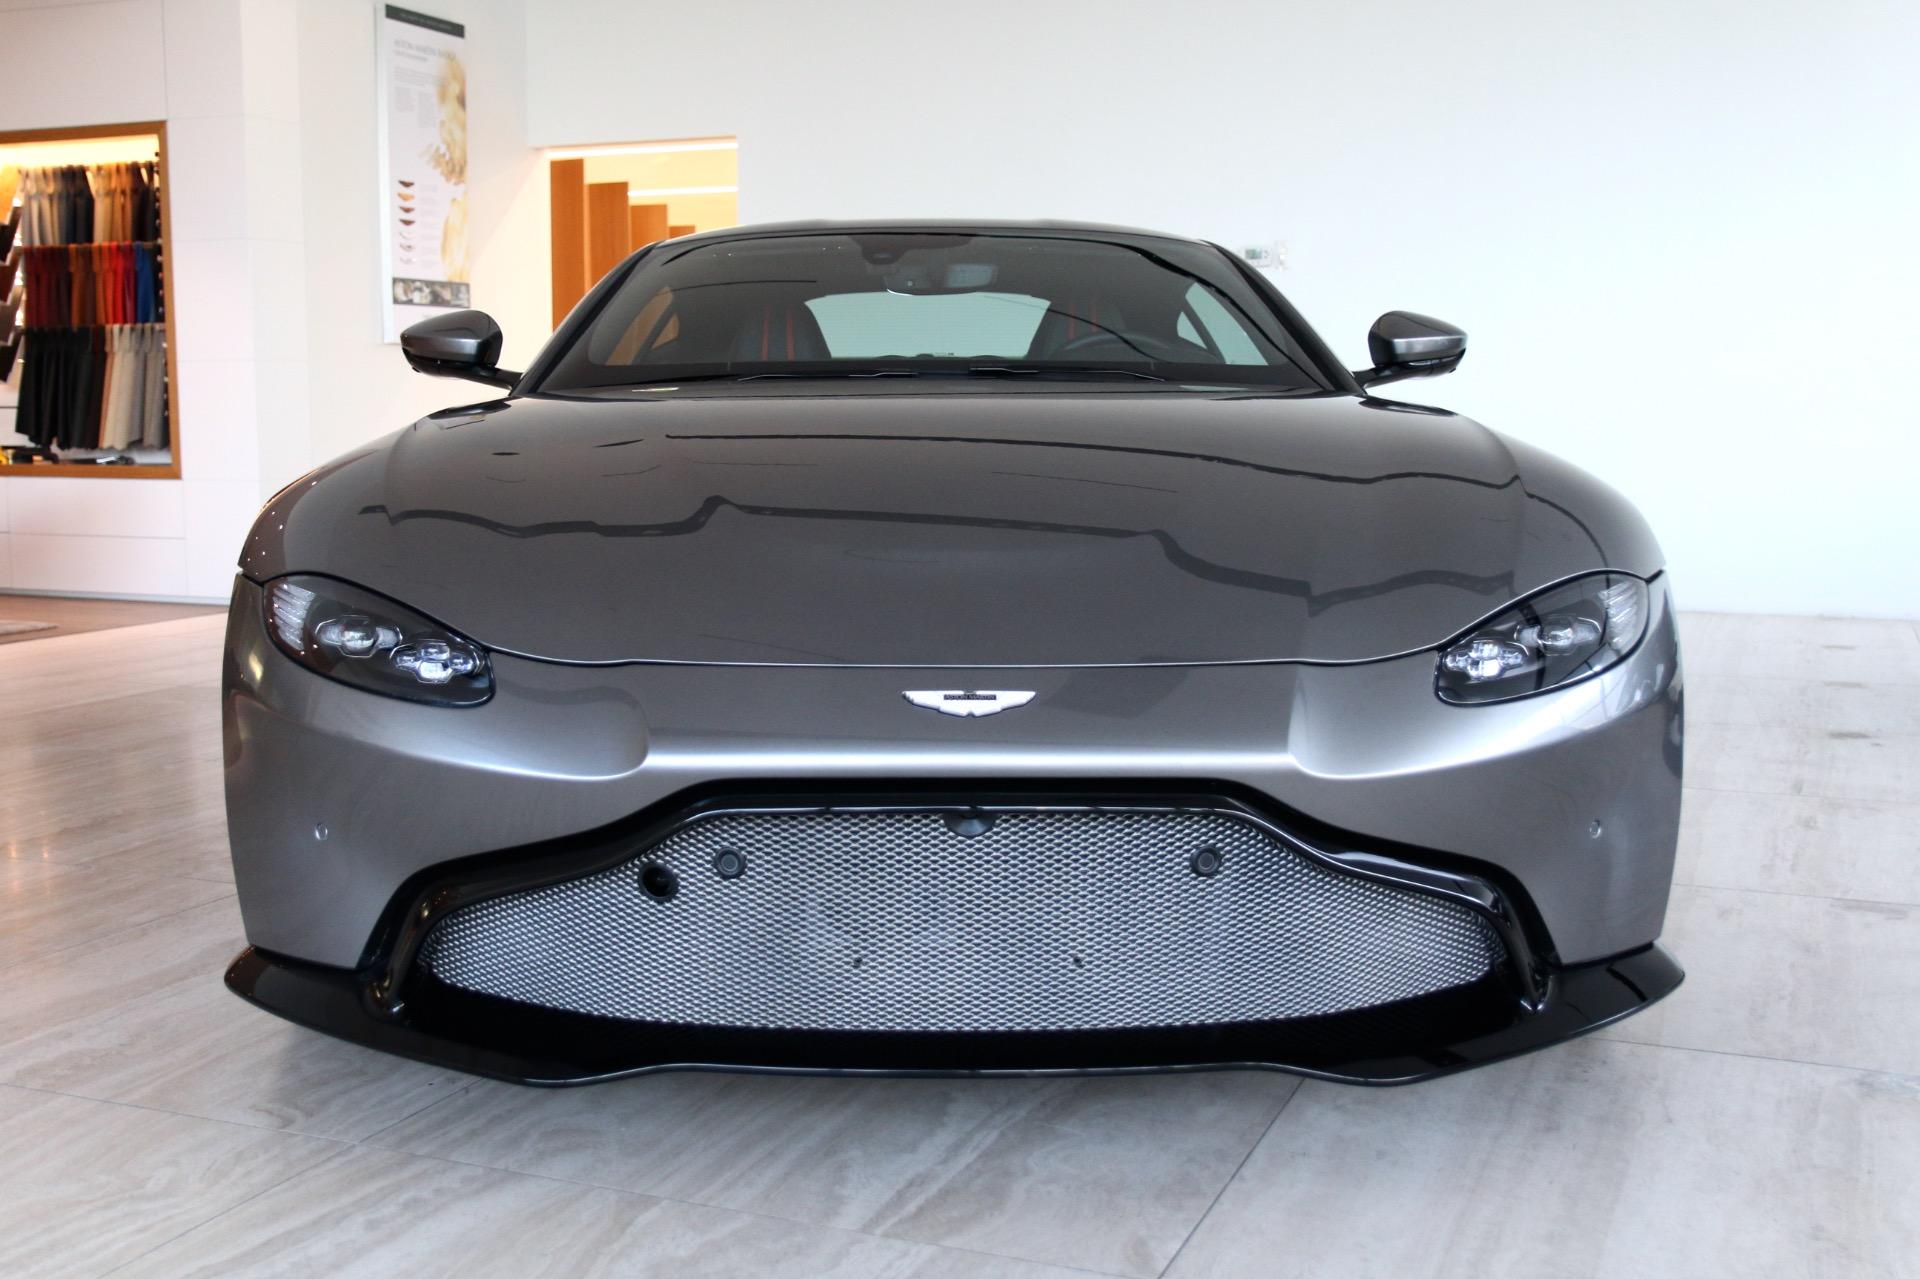 2019 Aston Martin Vantage Taking Orders Stock 9nx85250 For Sale